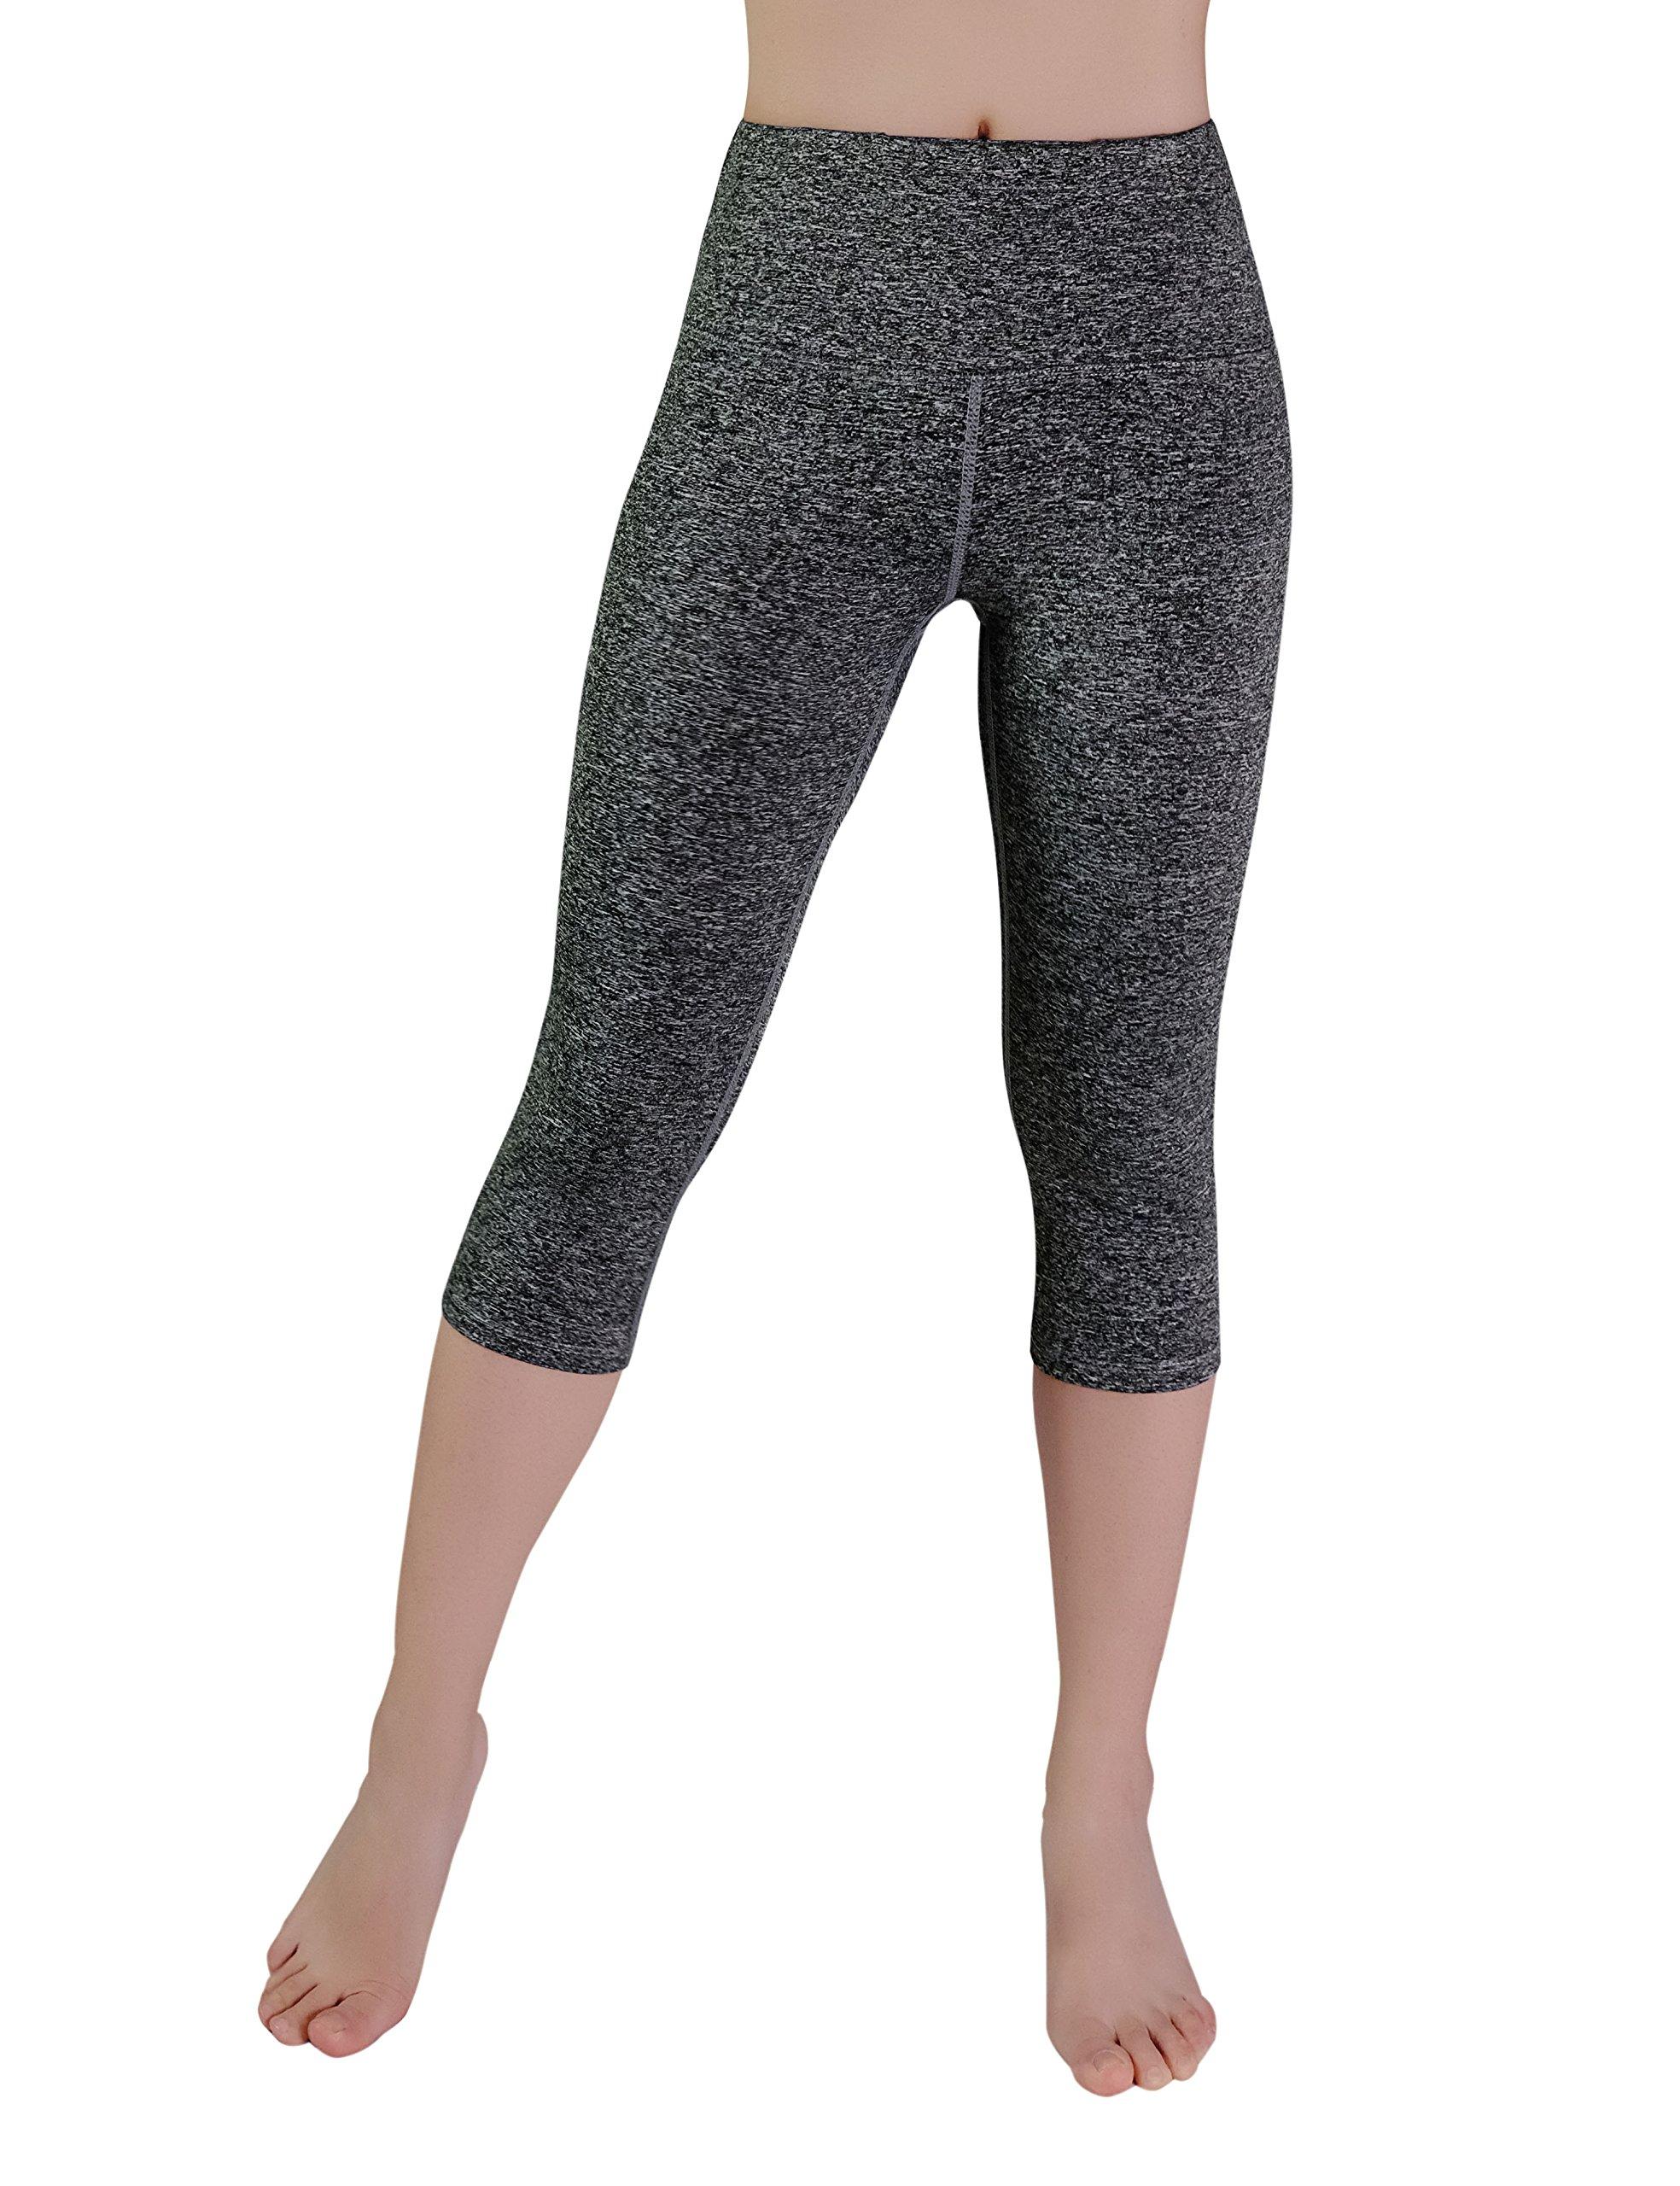 REETOYO Women's High Waisted Yoga Pants Tummy Control Yoga Capris Leggings with Pocket